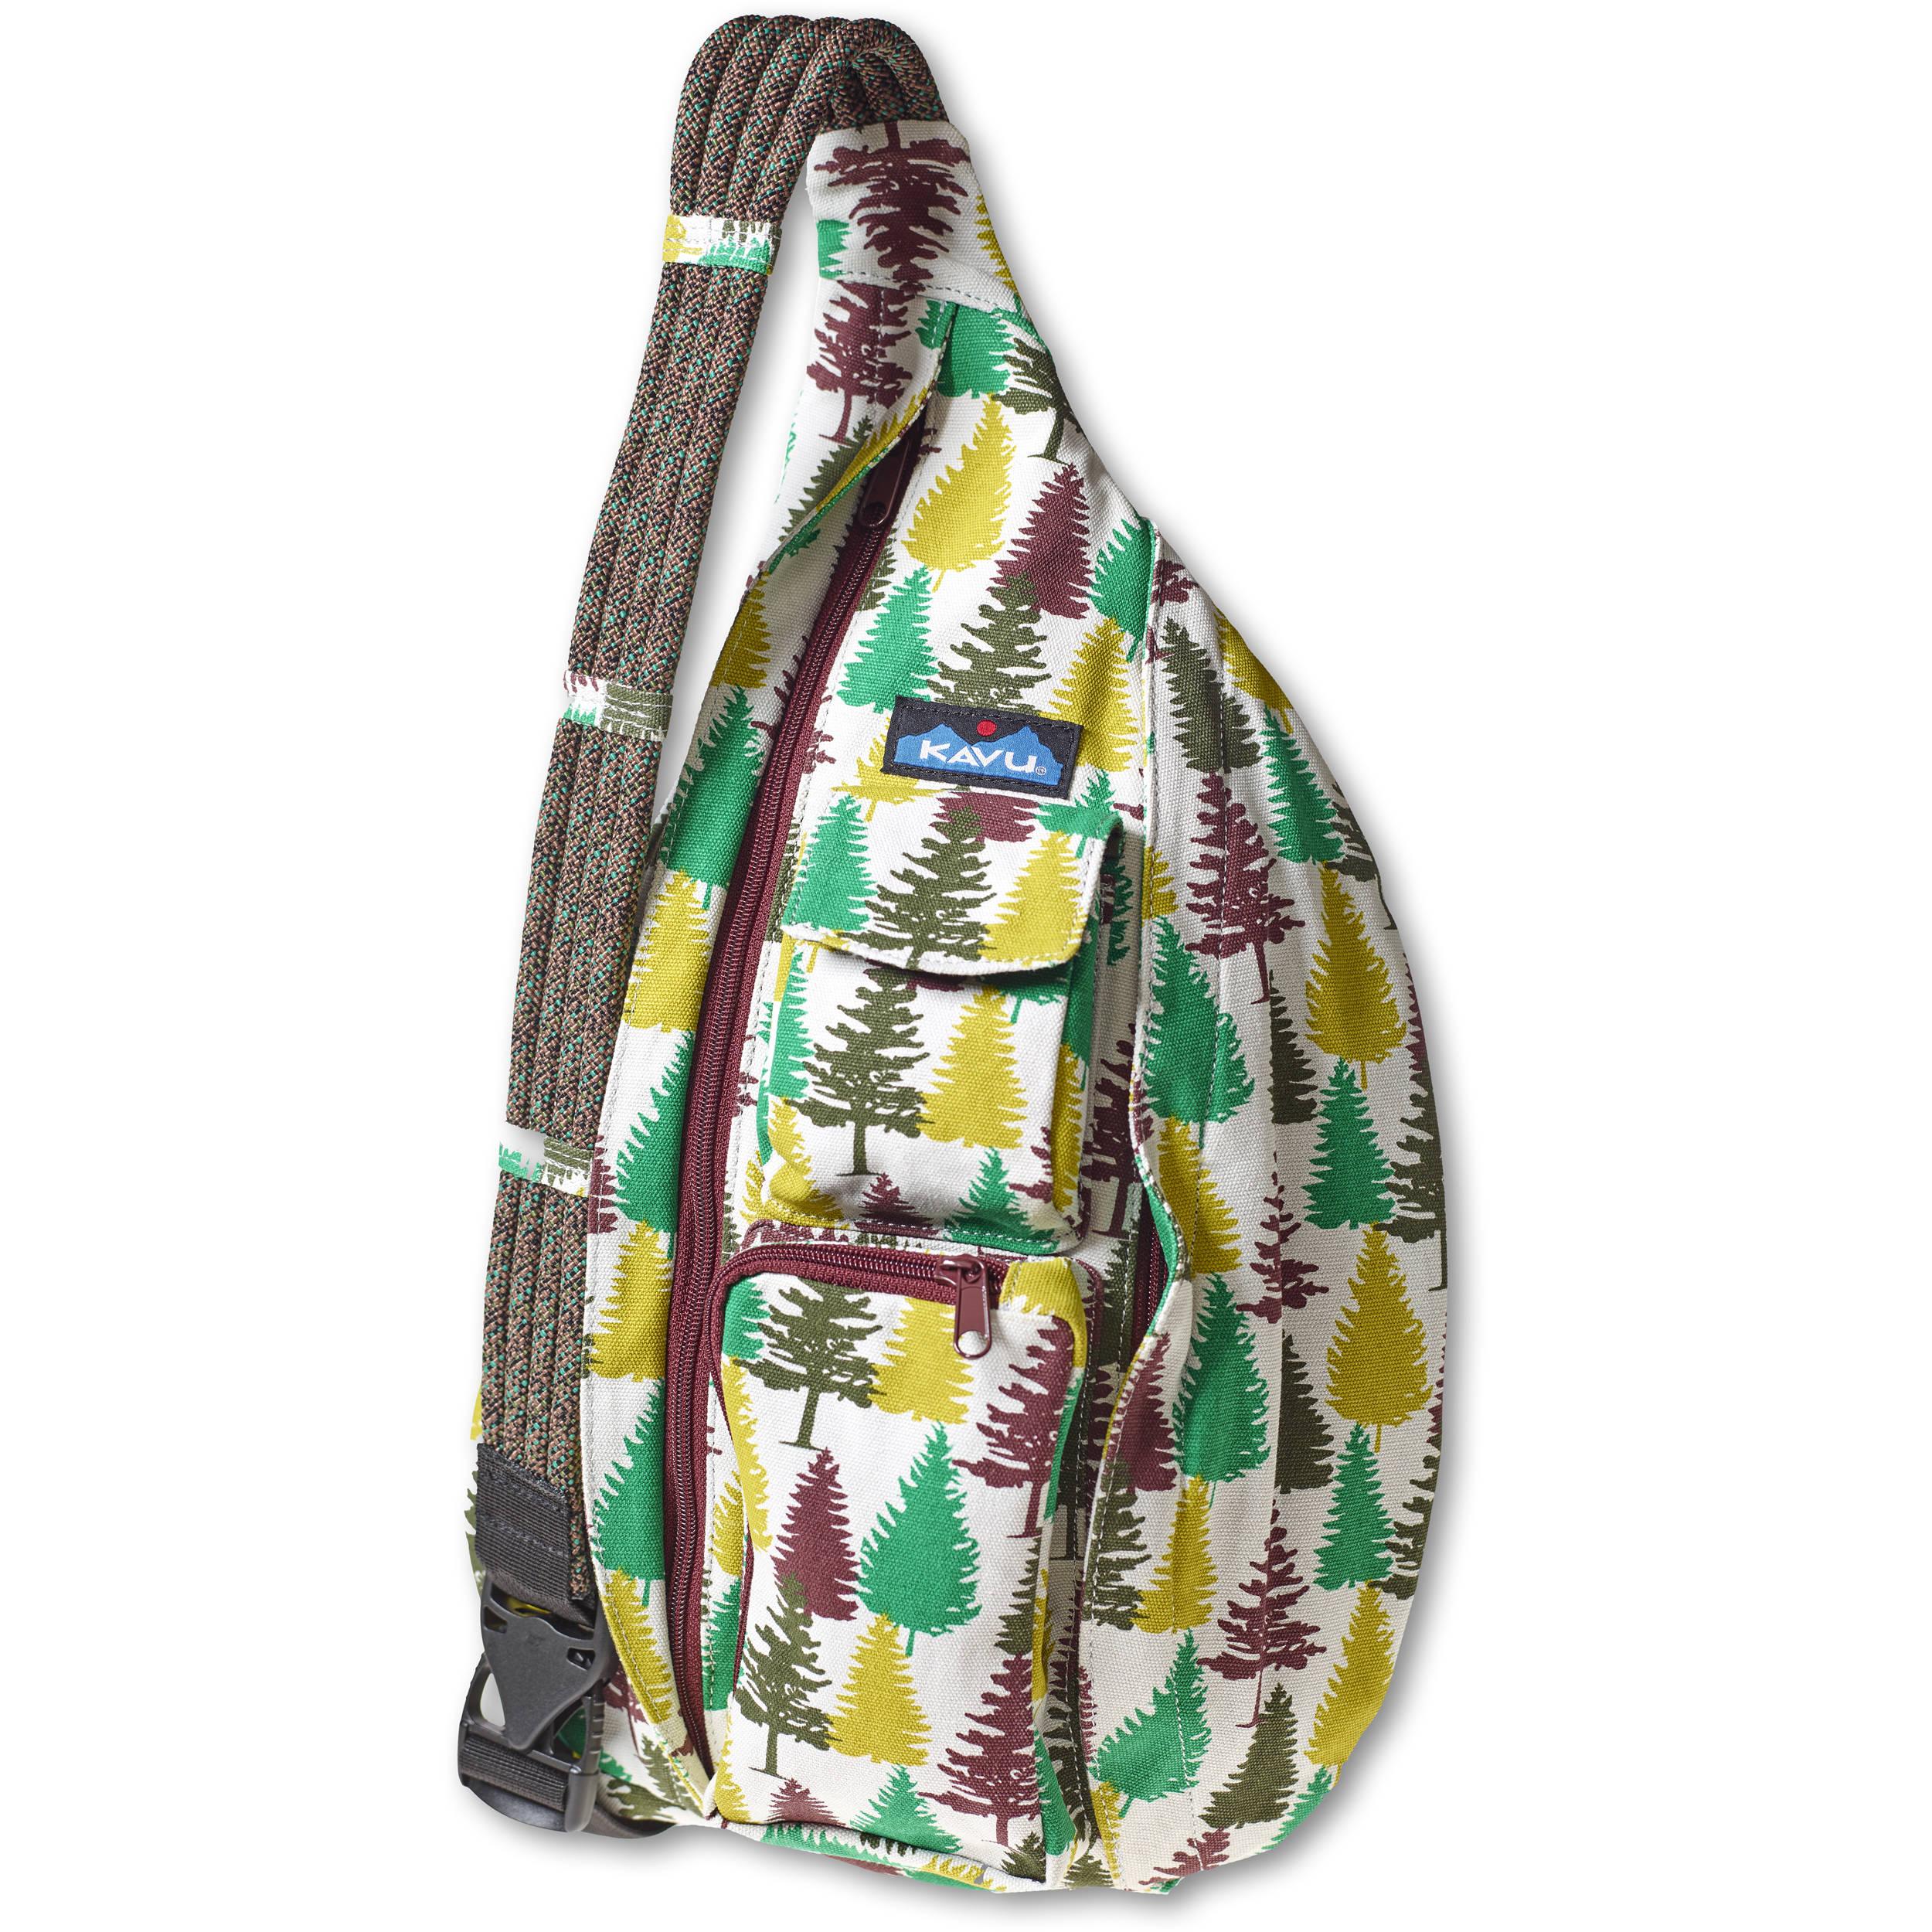 Kavu Rope Bag Woodlands